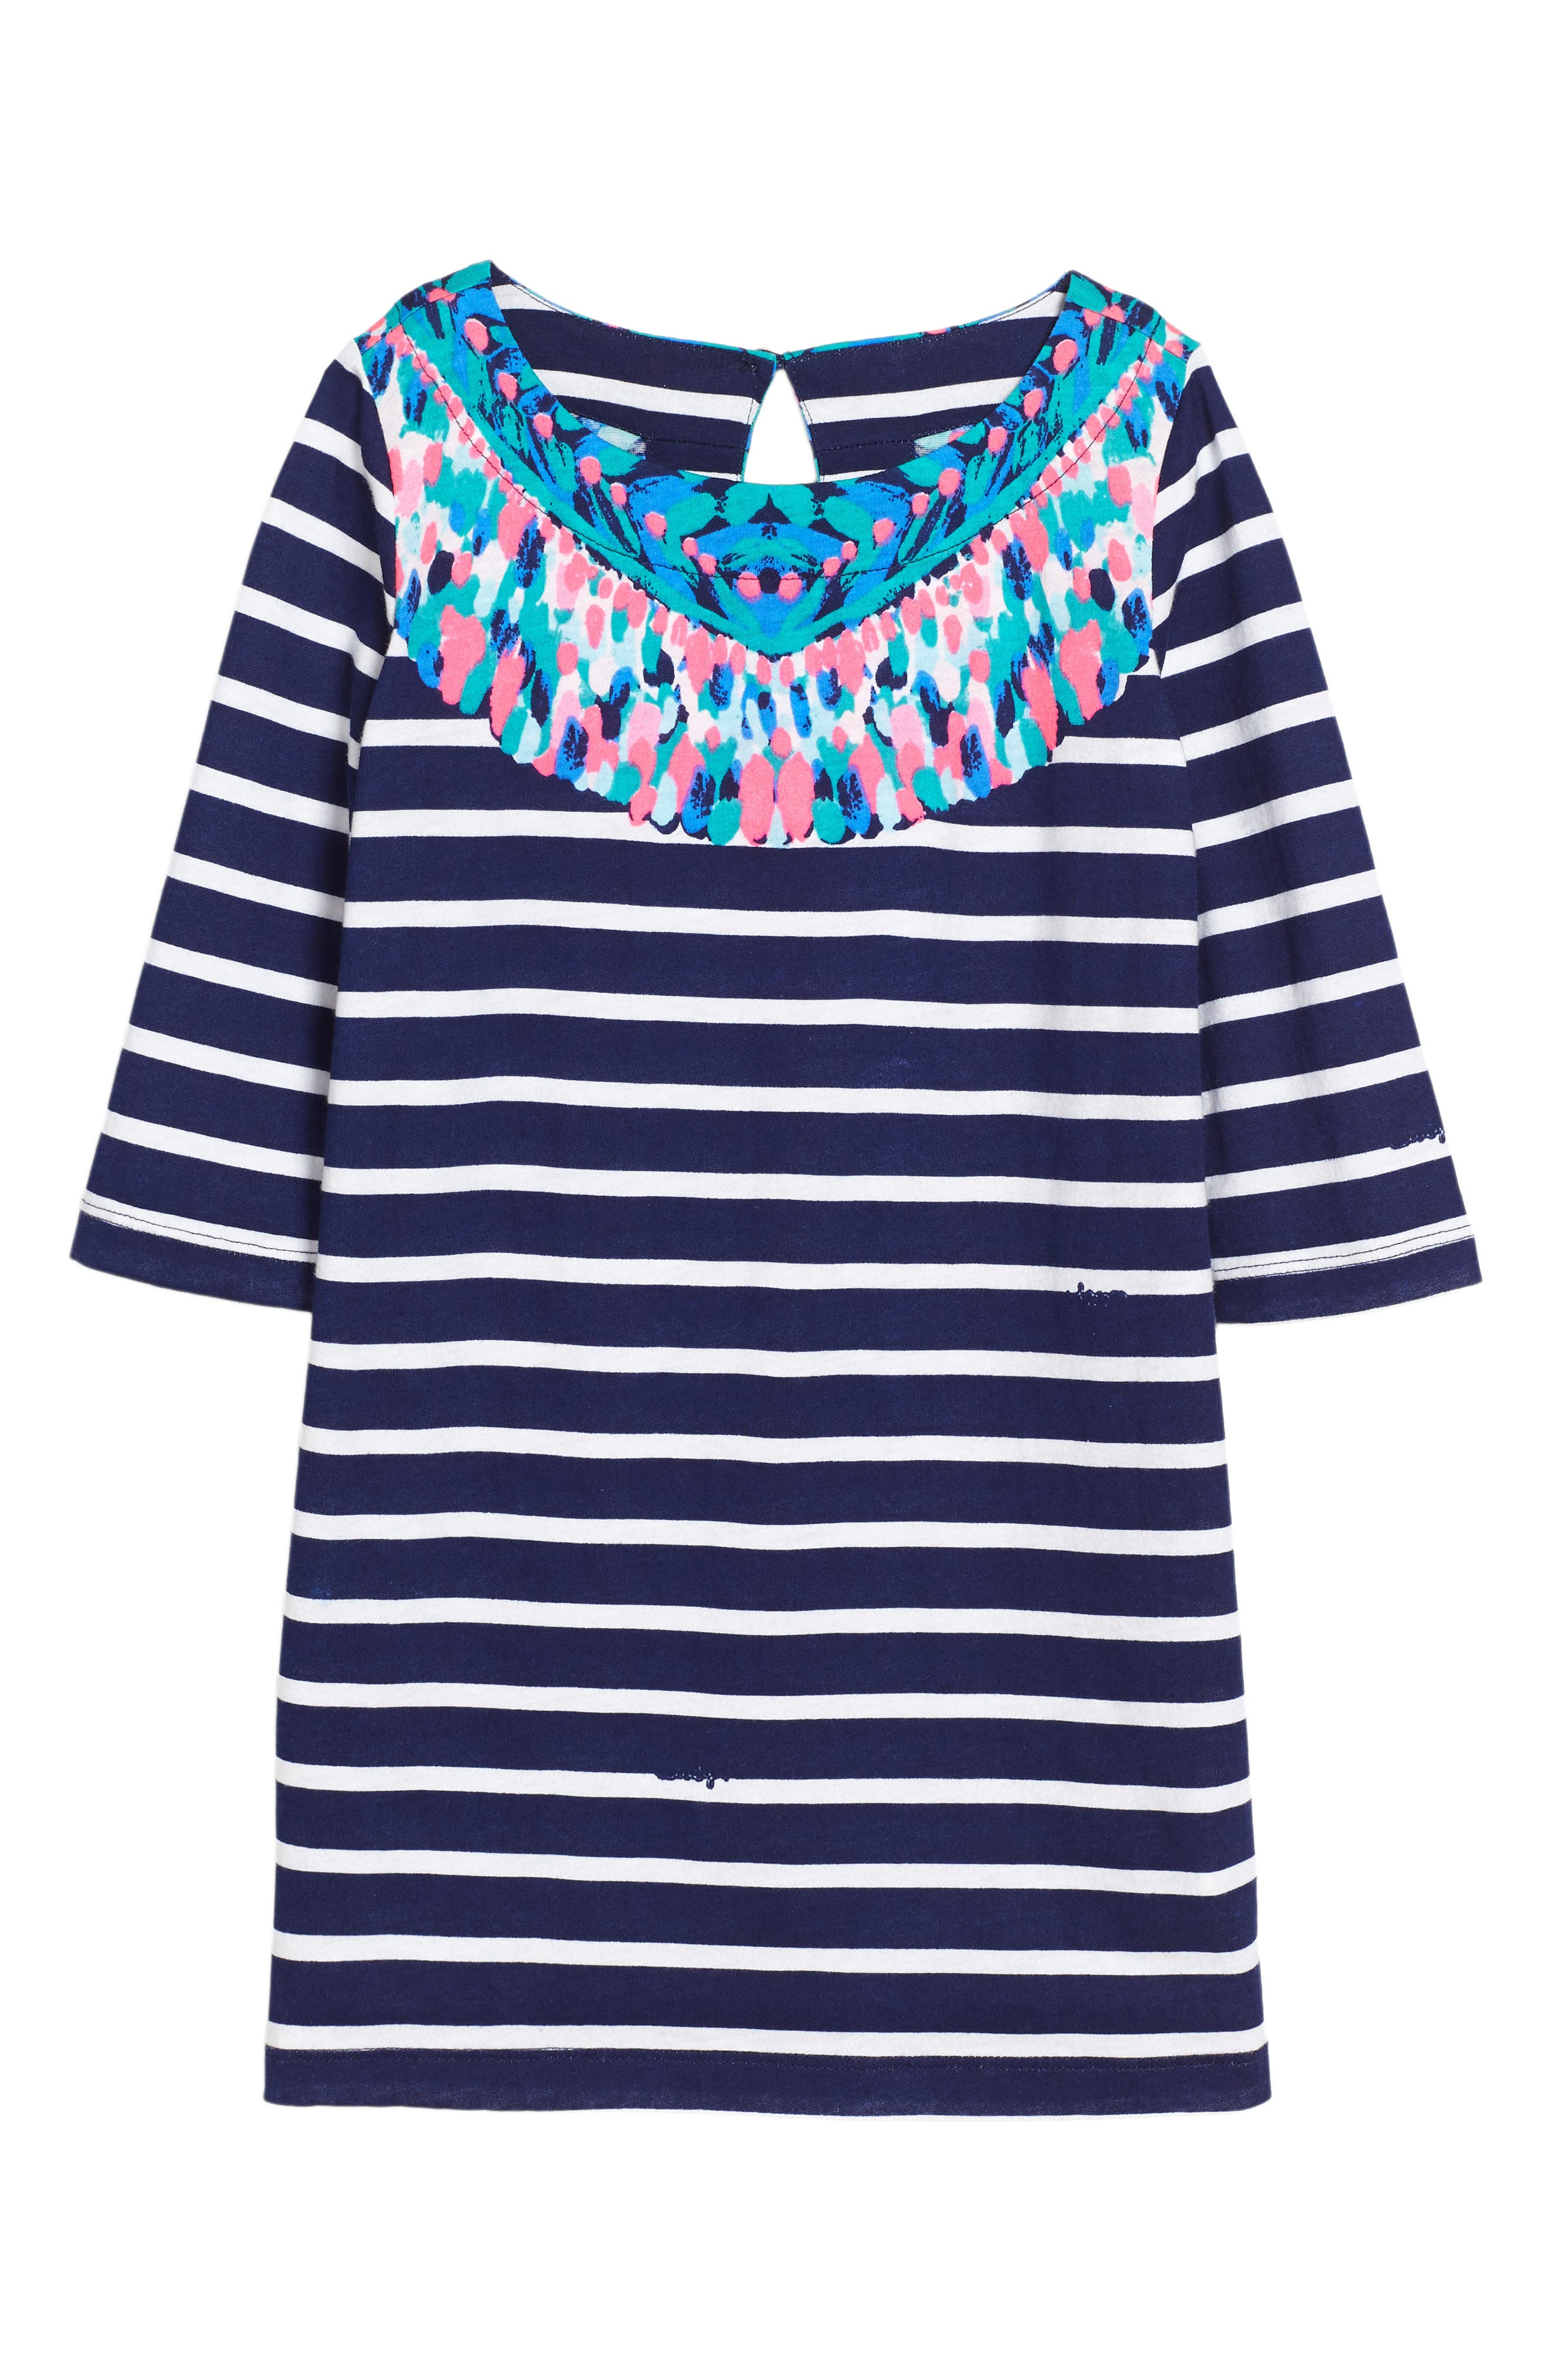 Lilly Pulitzer® Little Bay Stripe Dress (Toddler Girls, Little Girls & Big Girls)